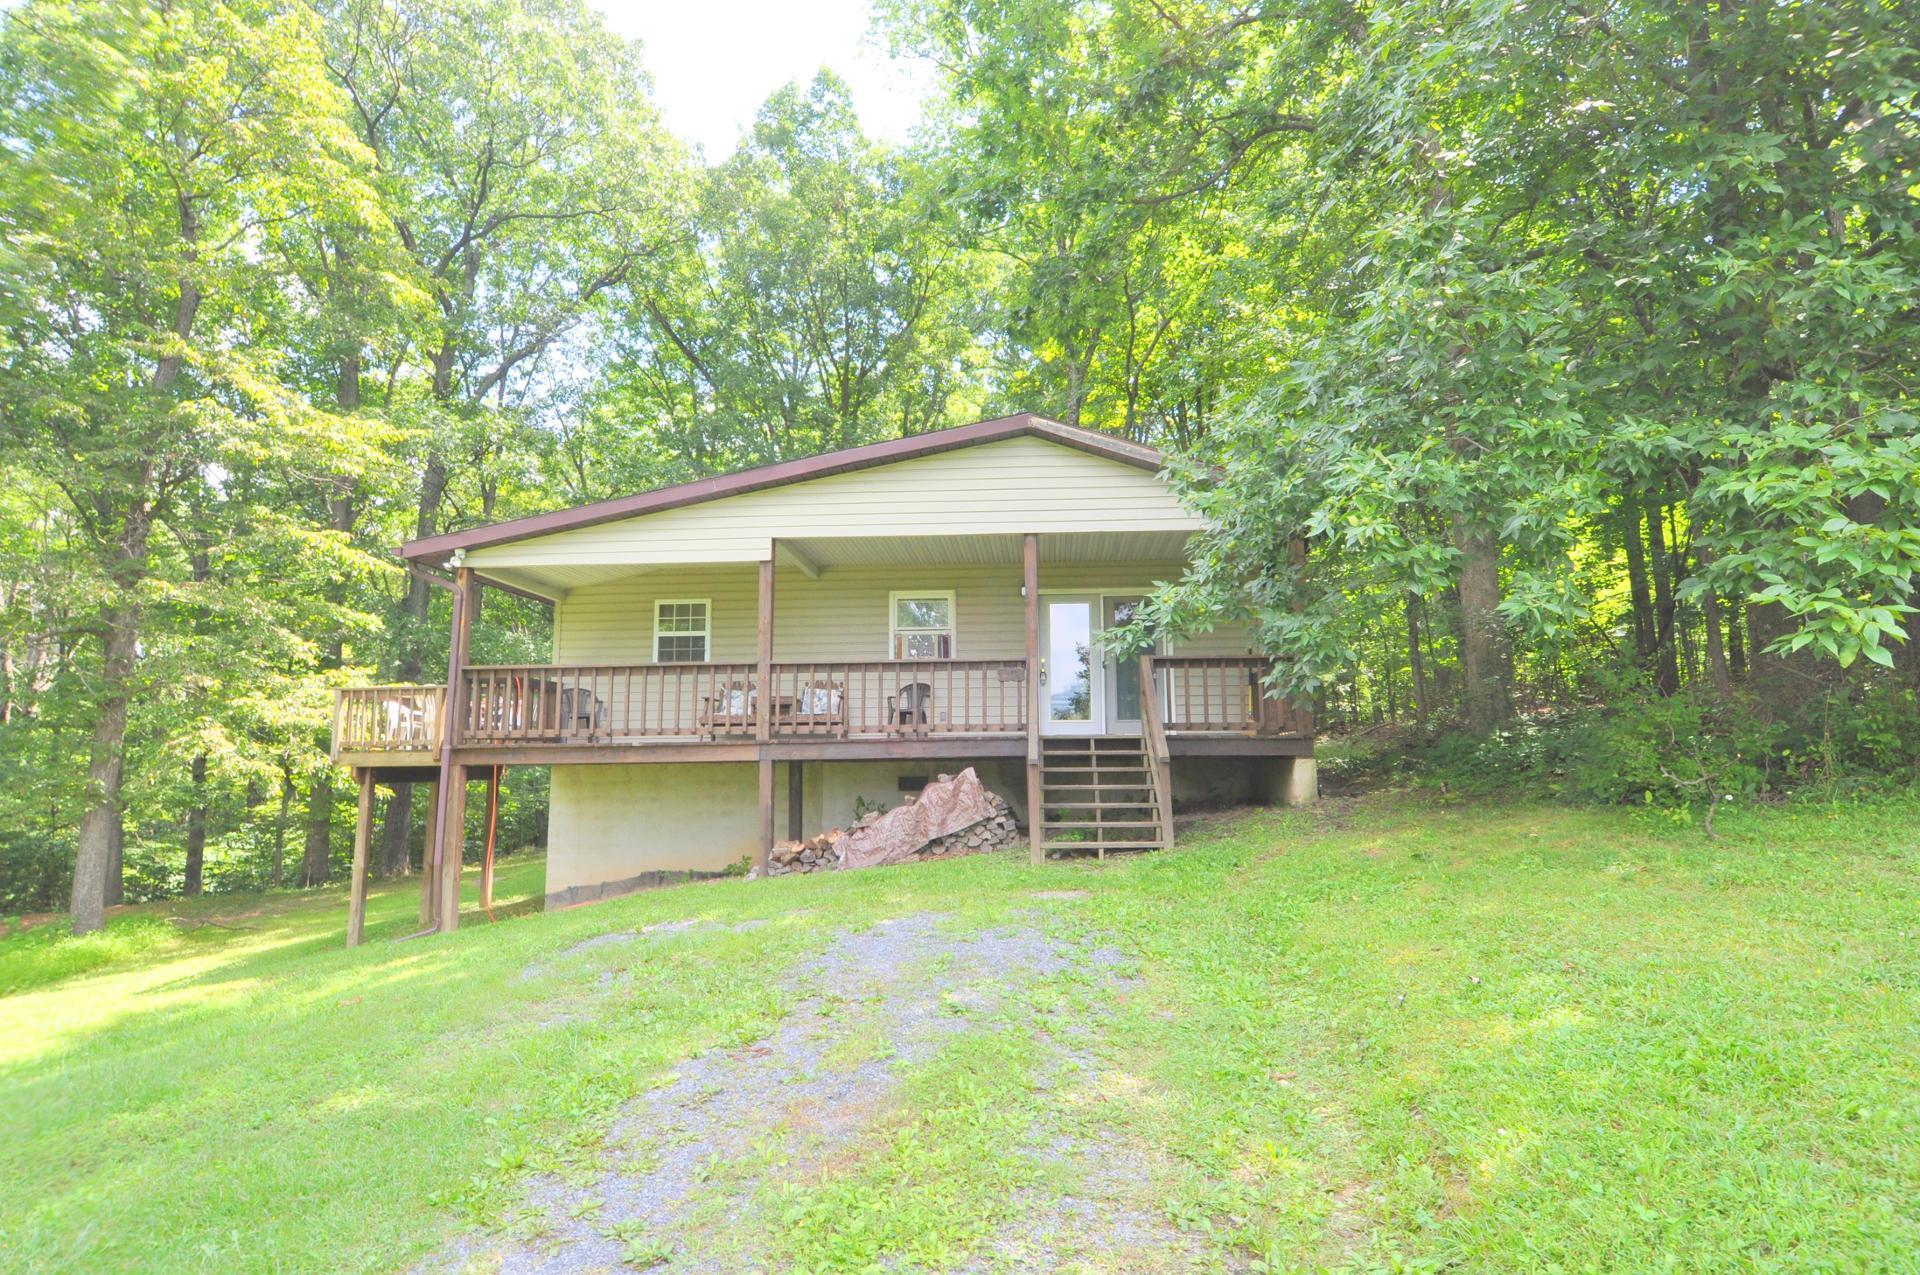 Davis Delight rental home at Berkeley Springs Cottage Rentals in Berkeley Springs West Virginia